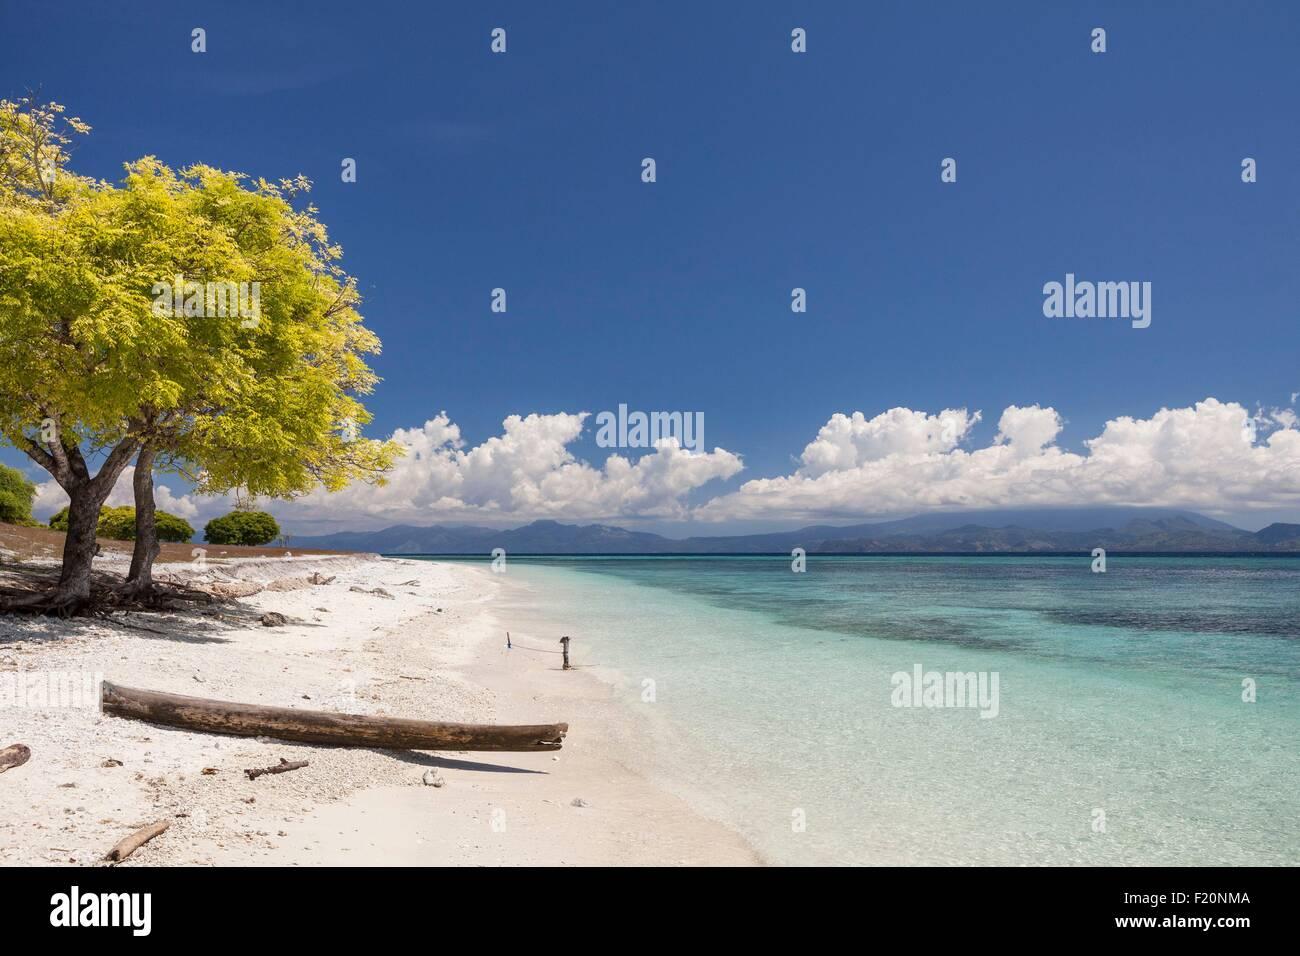 Indonesia, Lesser Sunda Islands, Alor archipelago, Kangge Island, beach - Stock Image